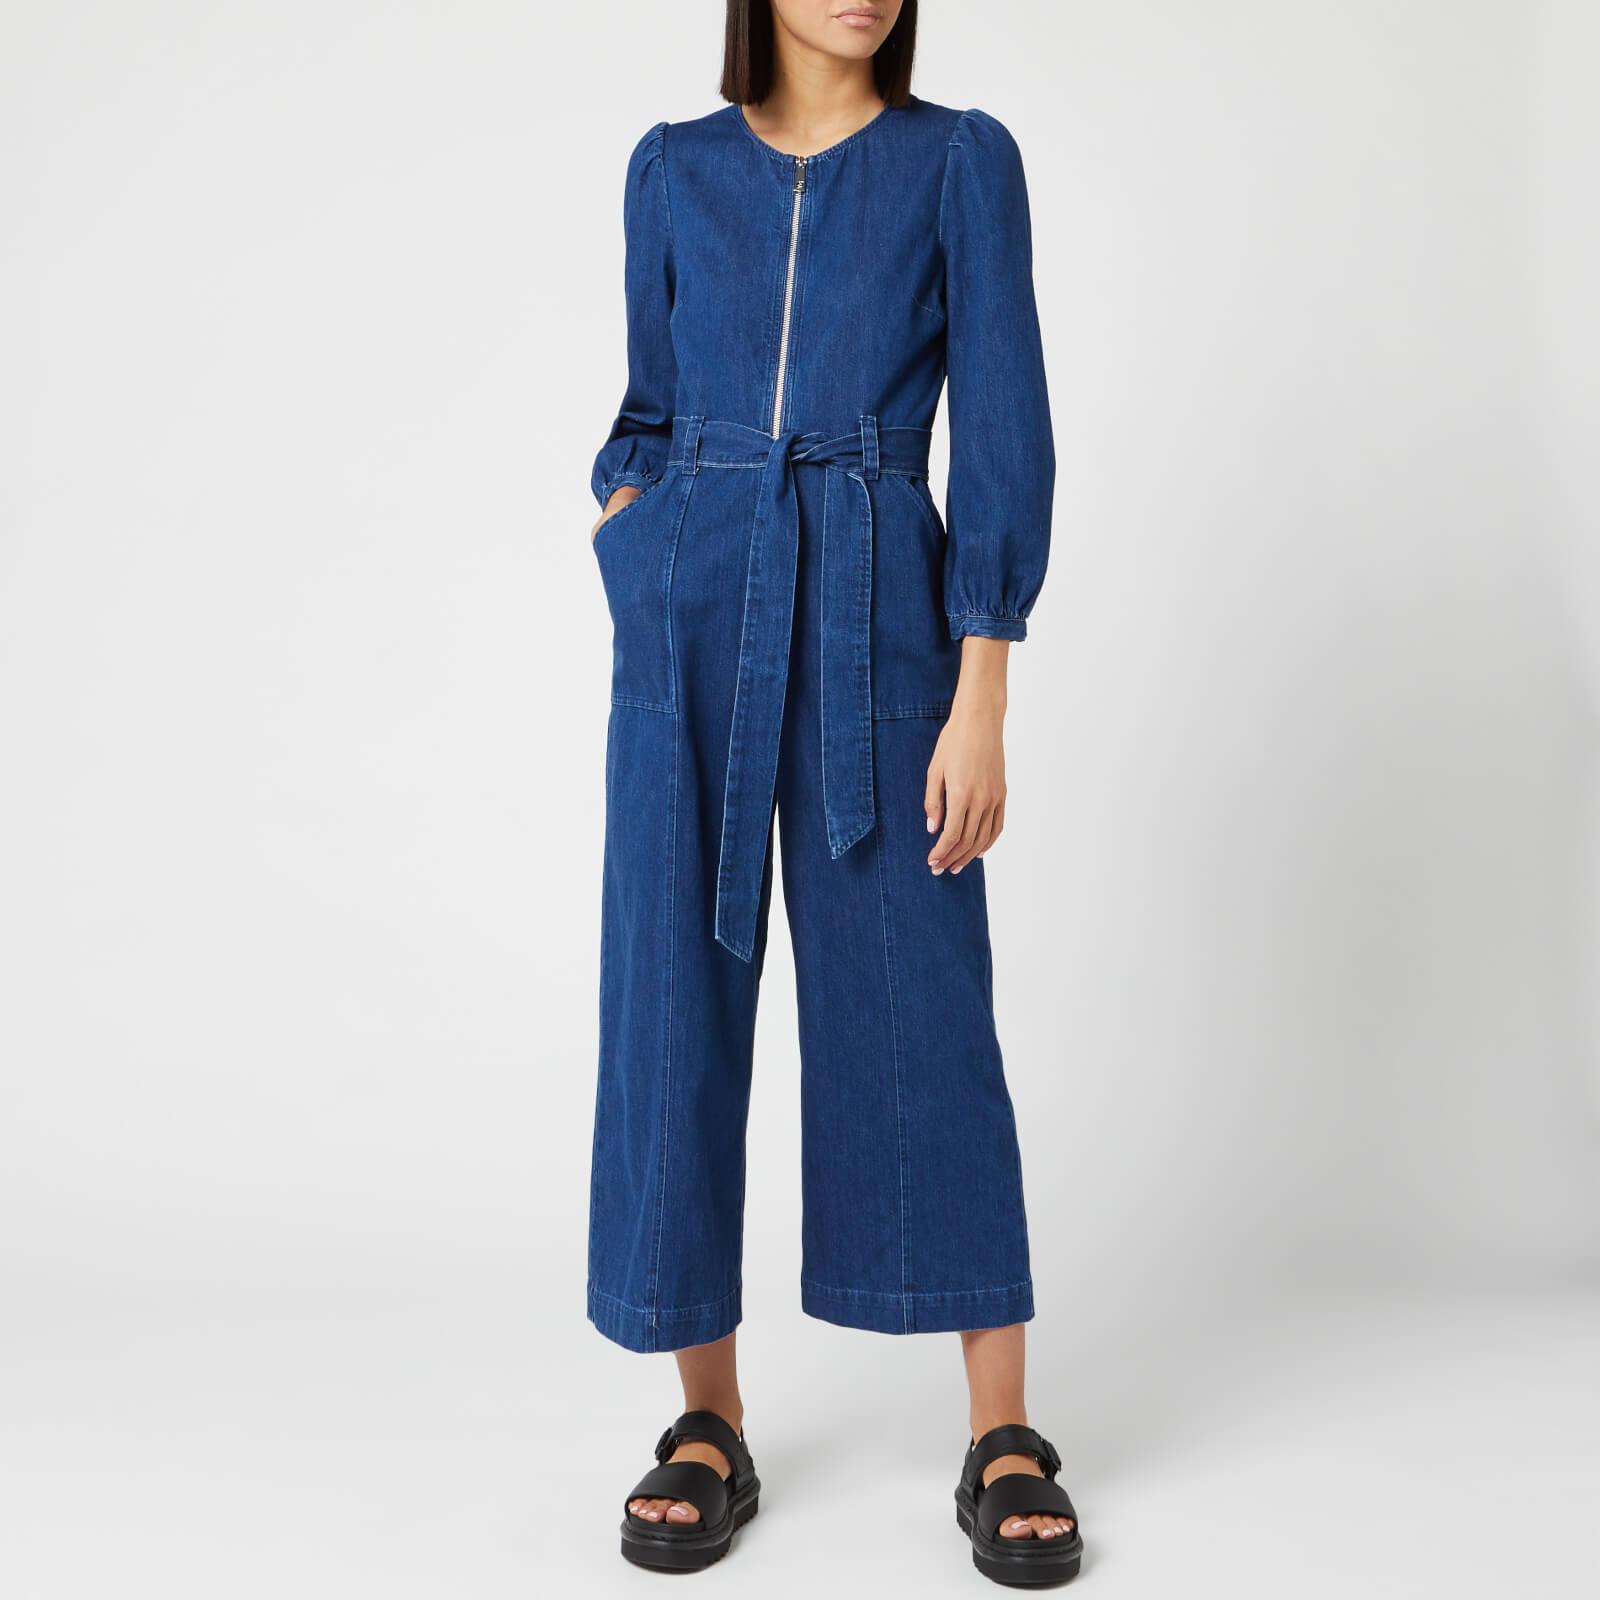 Whistles Women's Estelle Denim Jumpsuit - Blue - UK 14